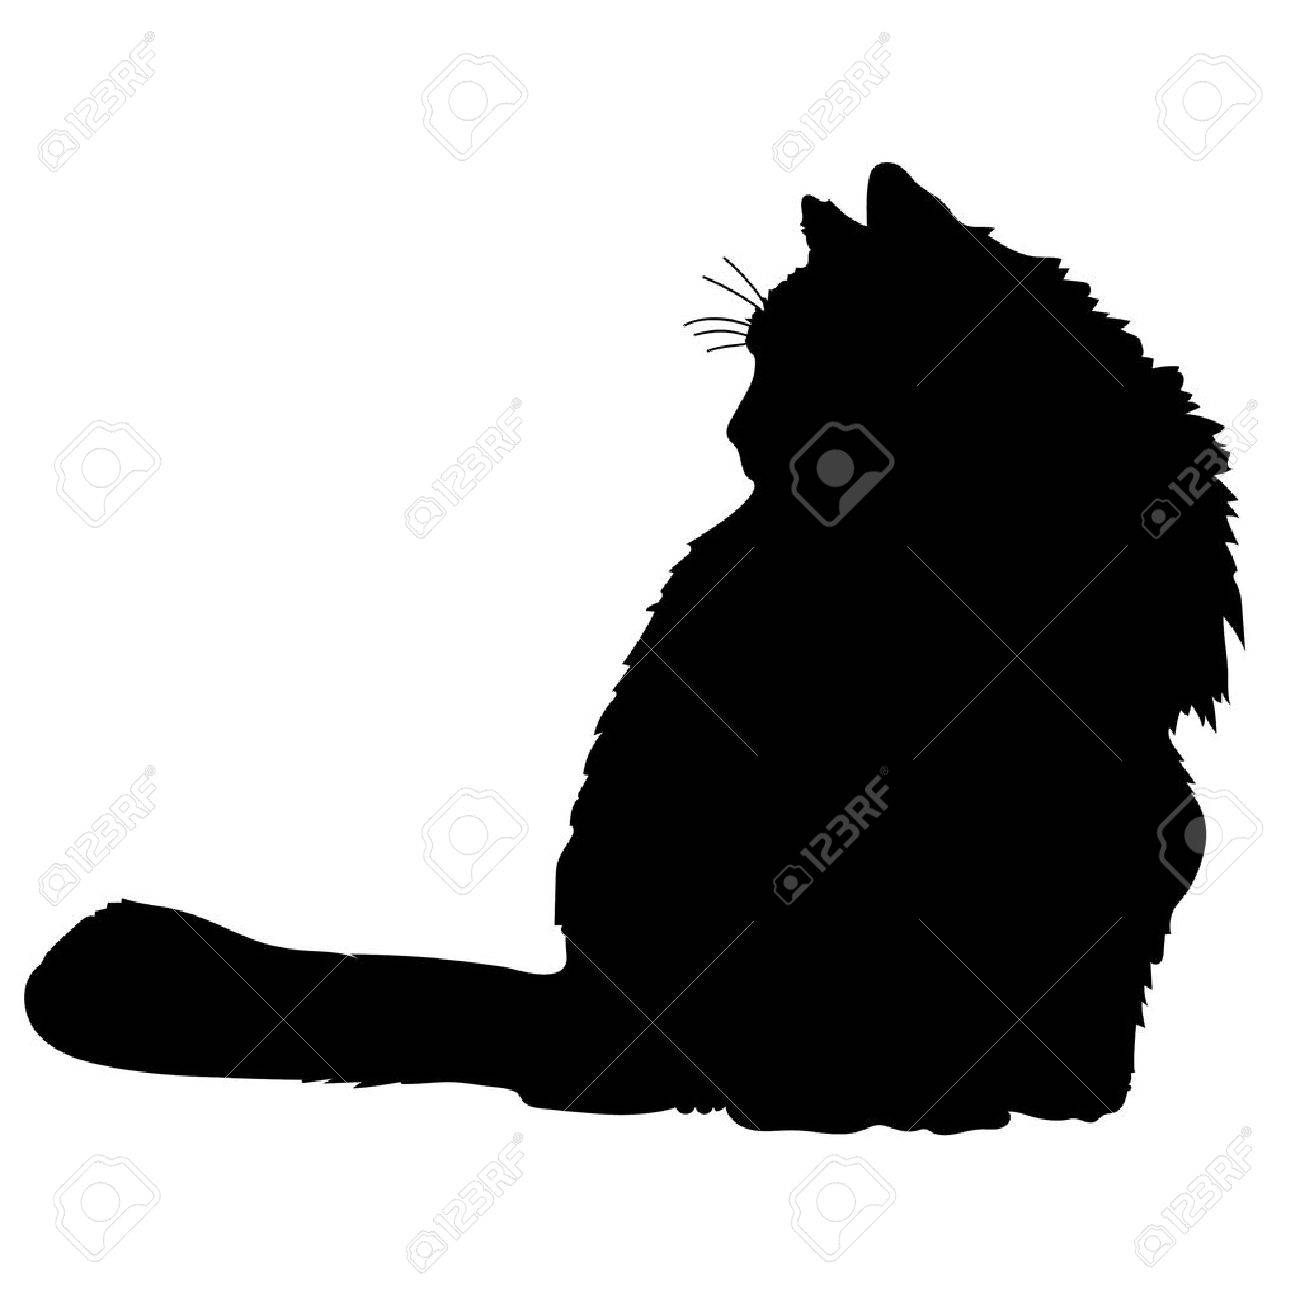 Una silueta de un gato negro Foto de archivo - 41855405